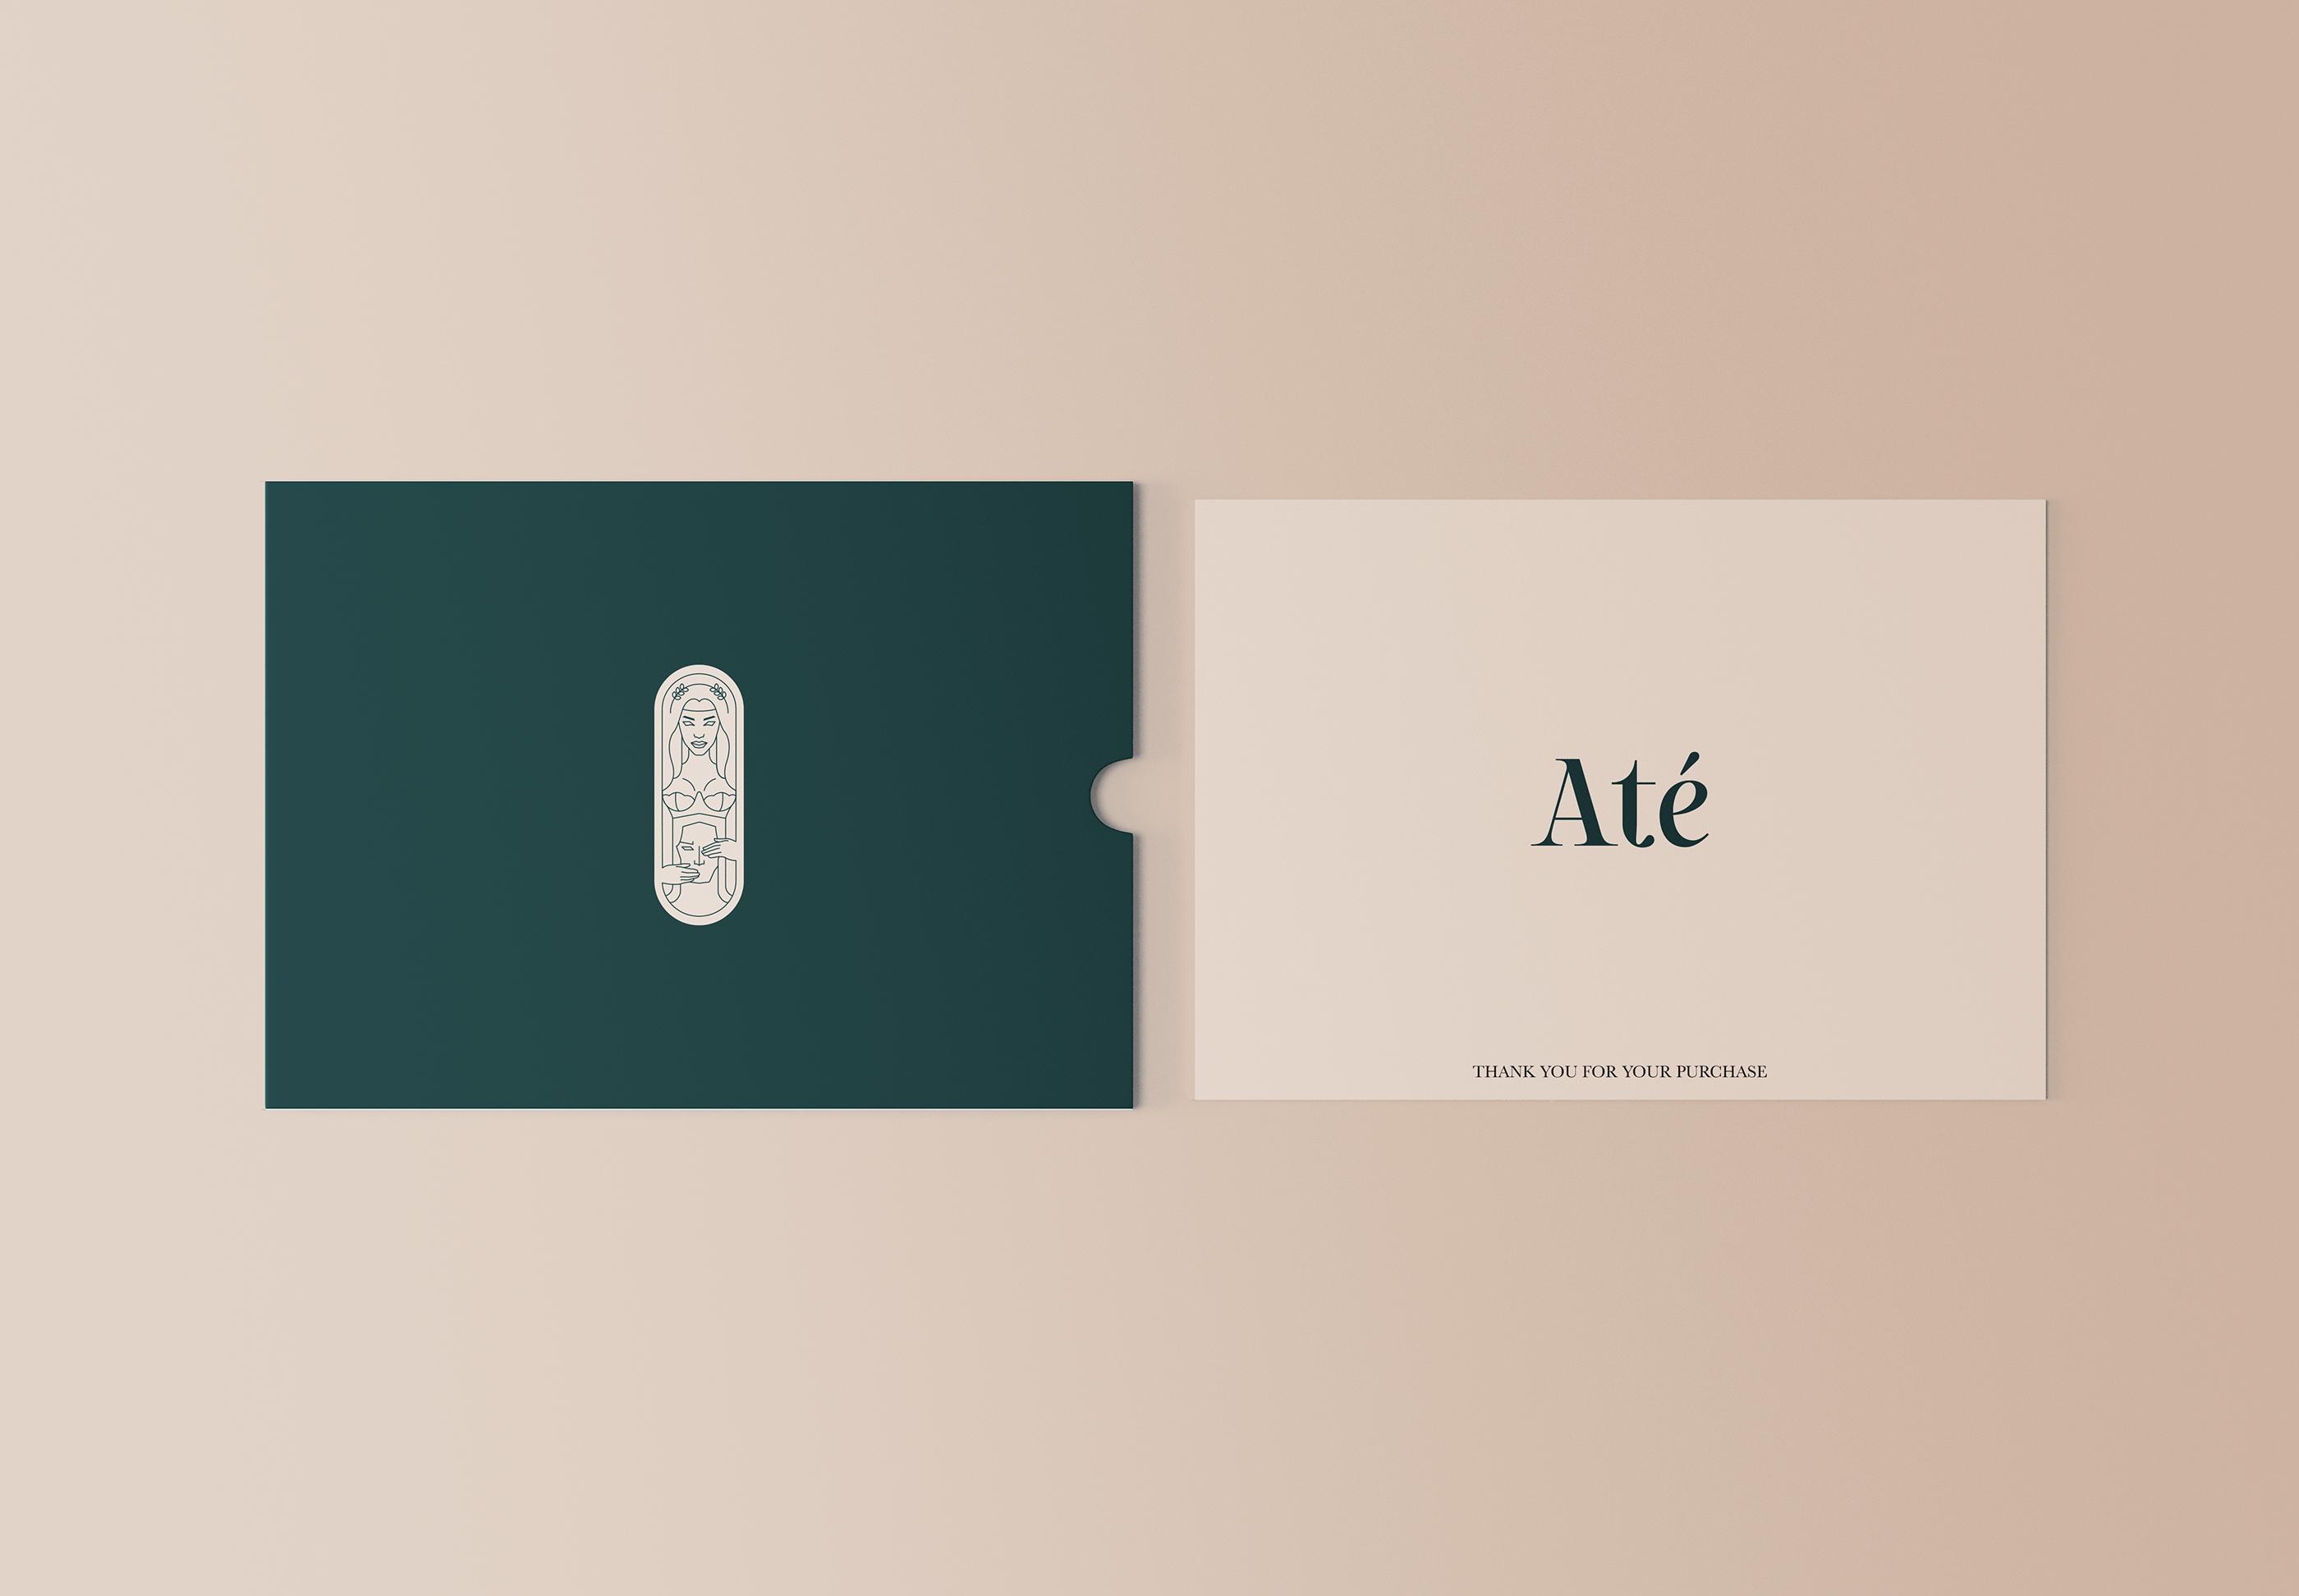 Até Lingerie brand concept by graphic design student Thao Tran.